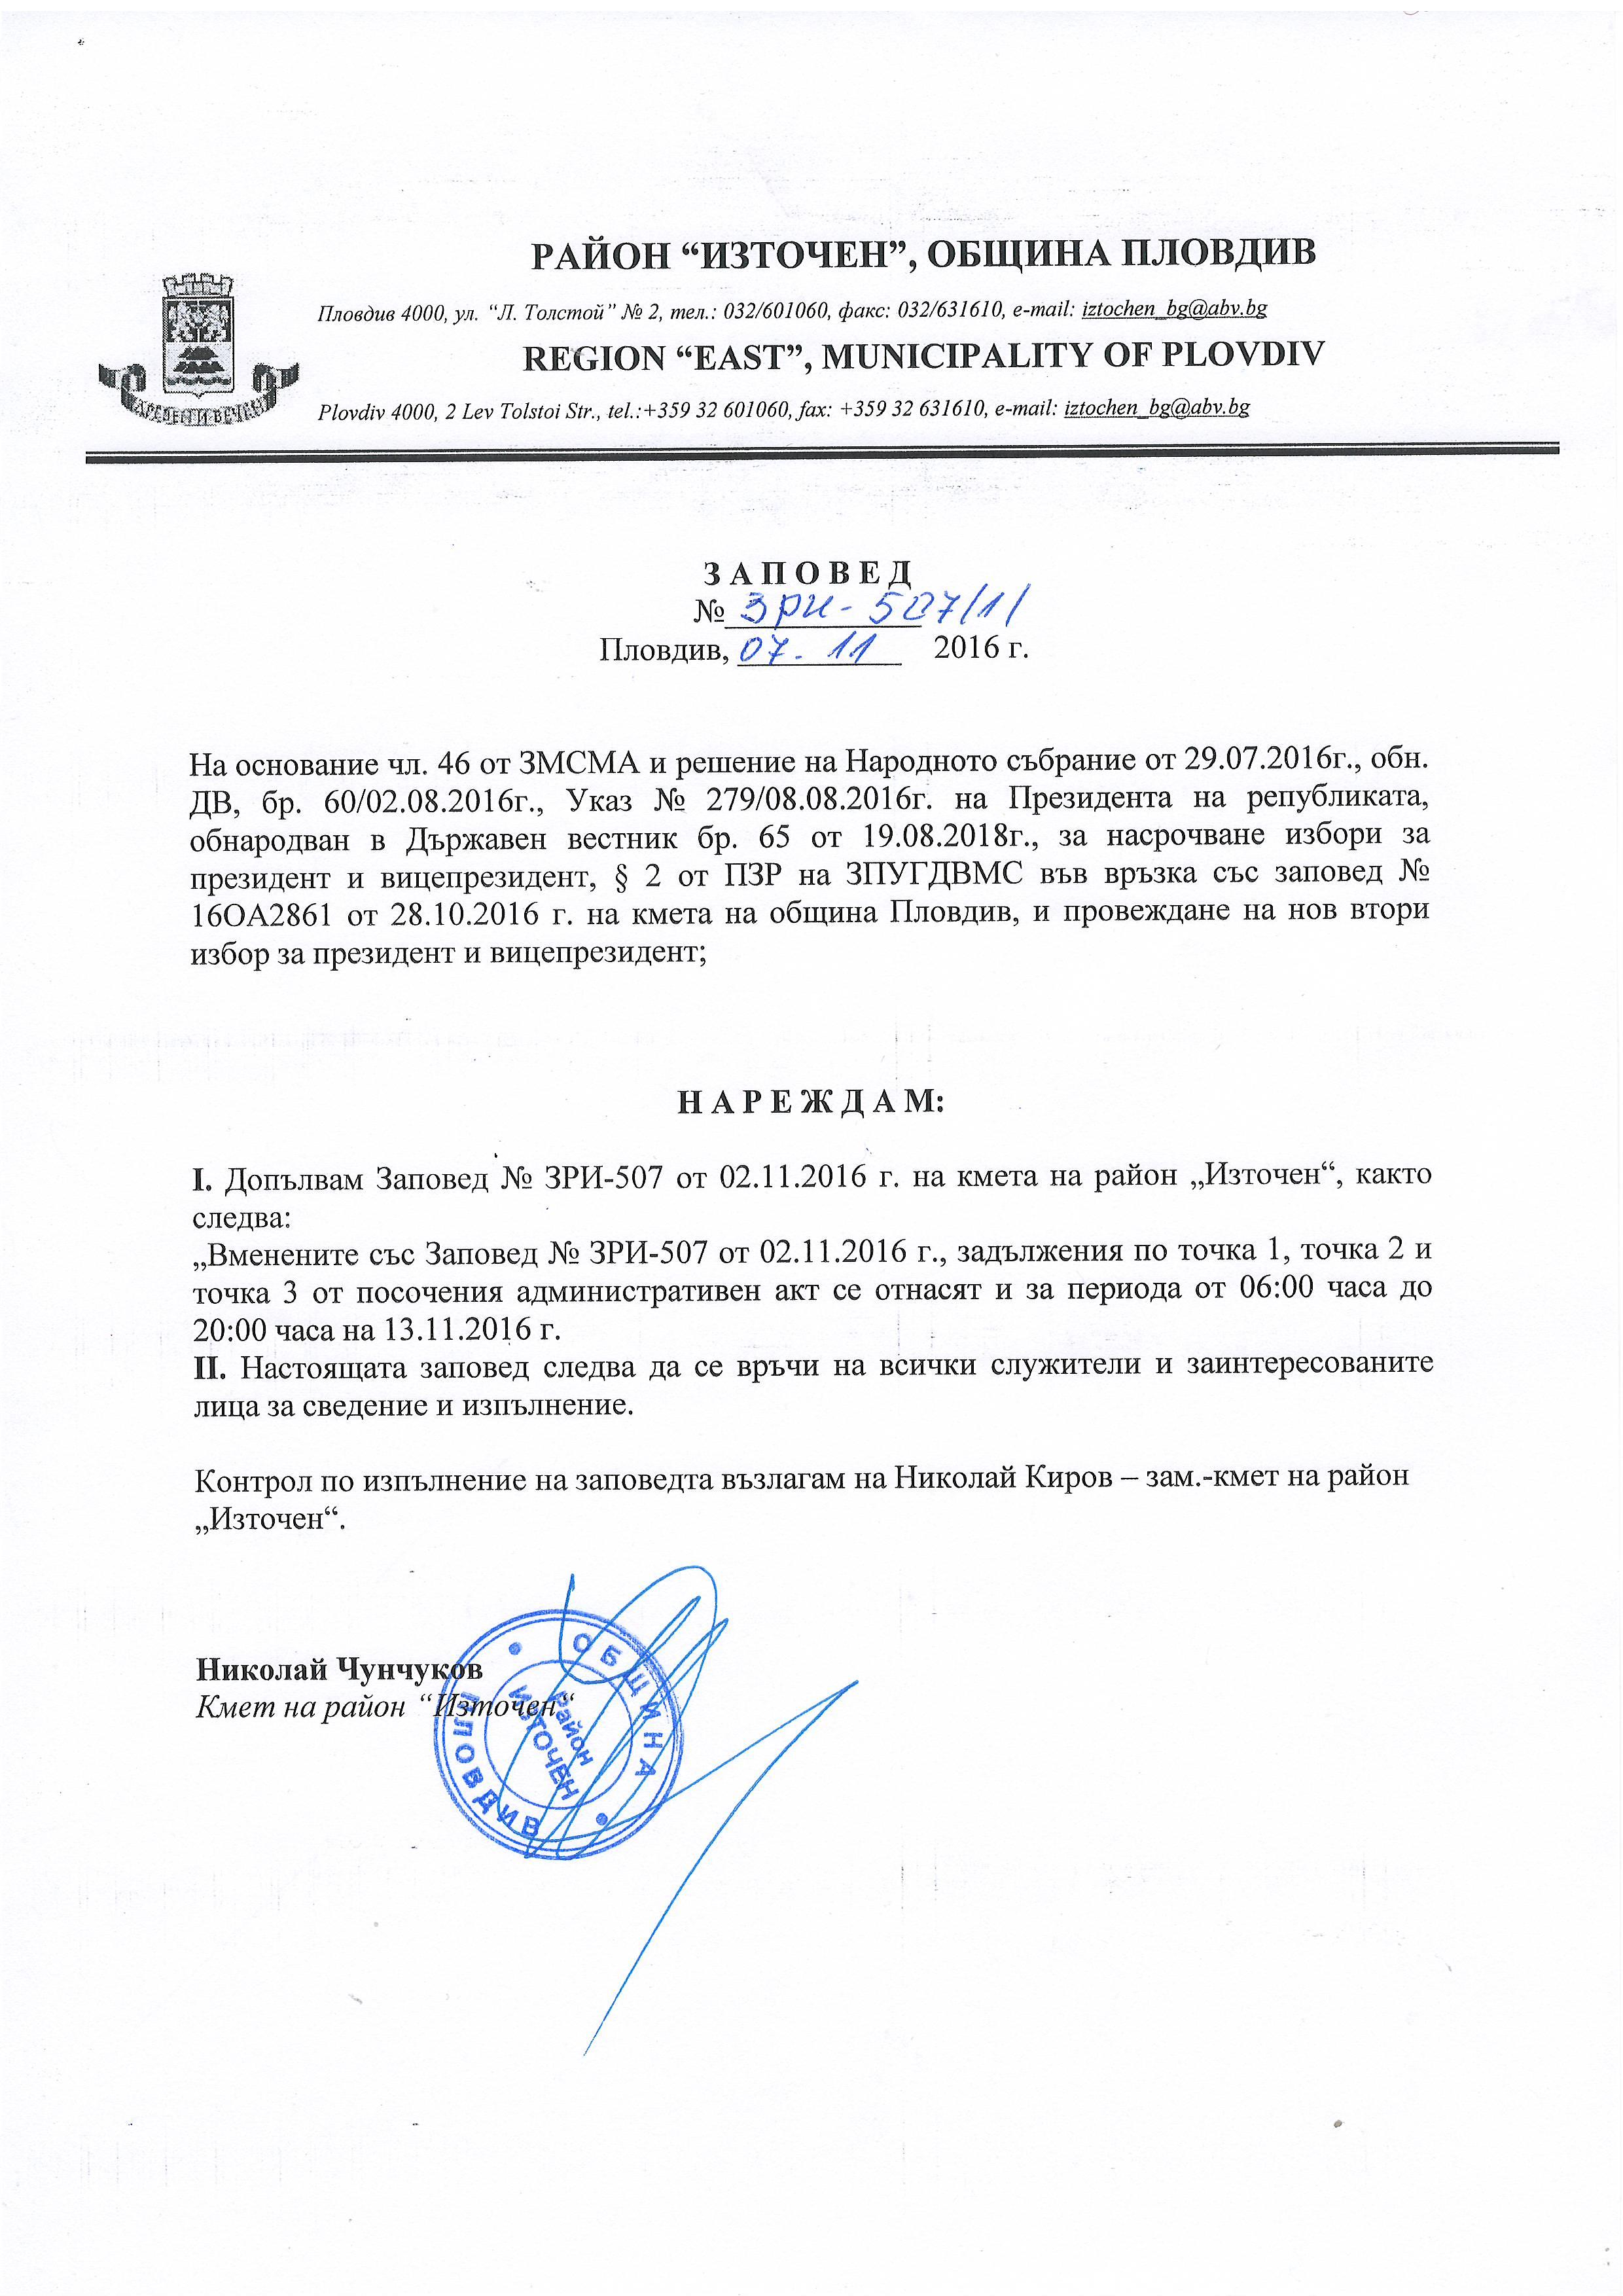 Заповед ЗРИ-507(1)/07.11.2016г.